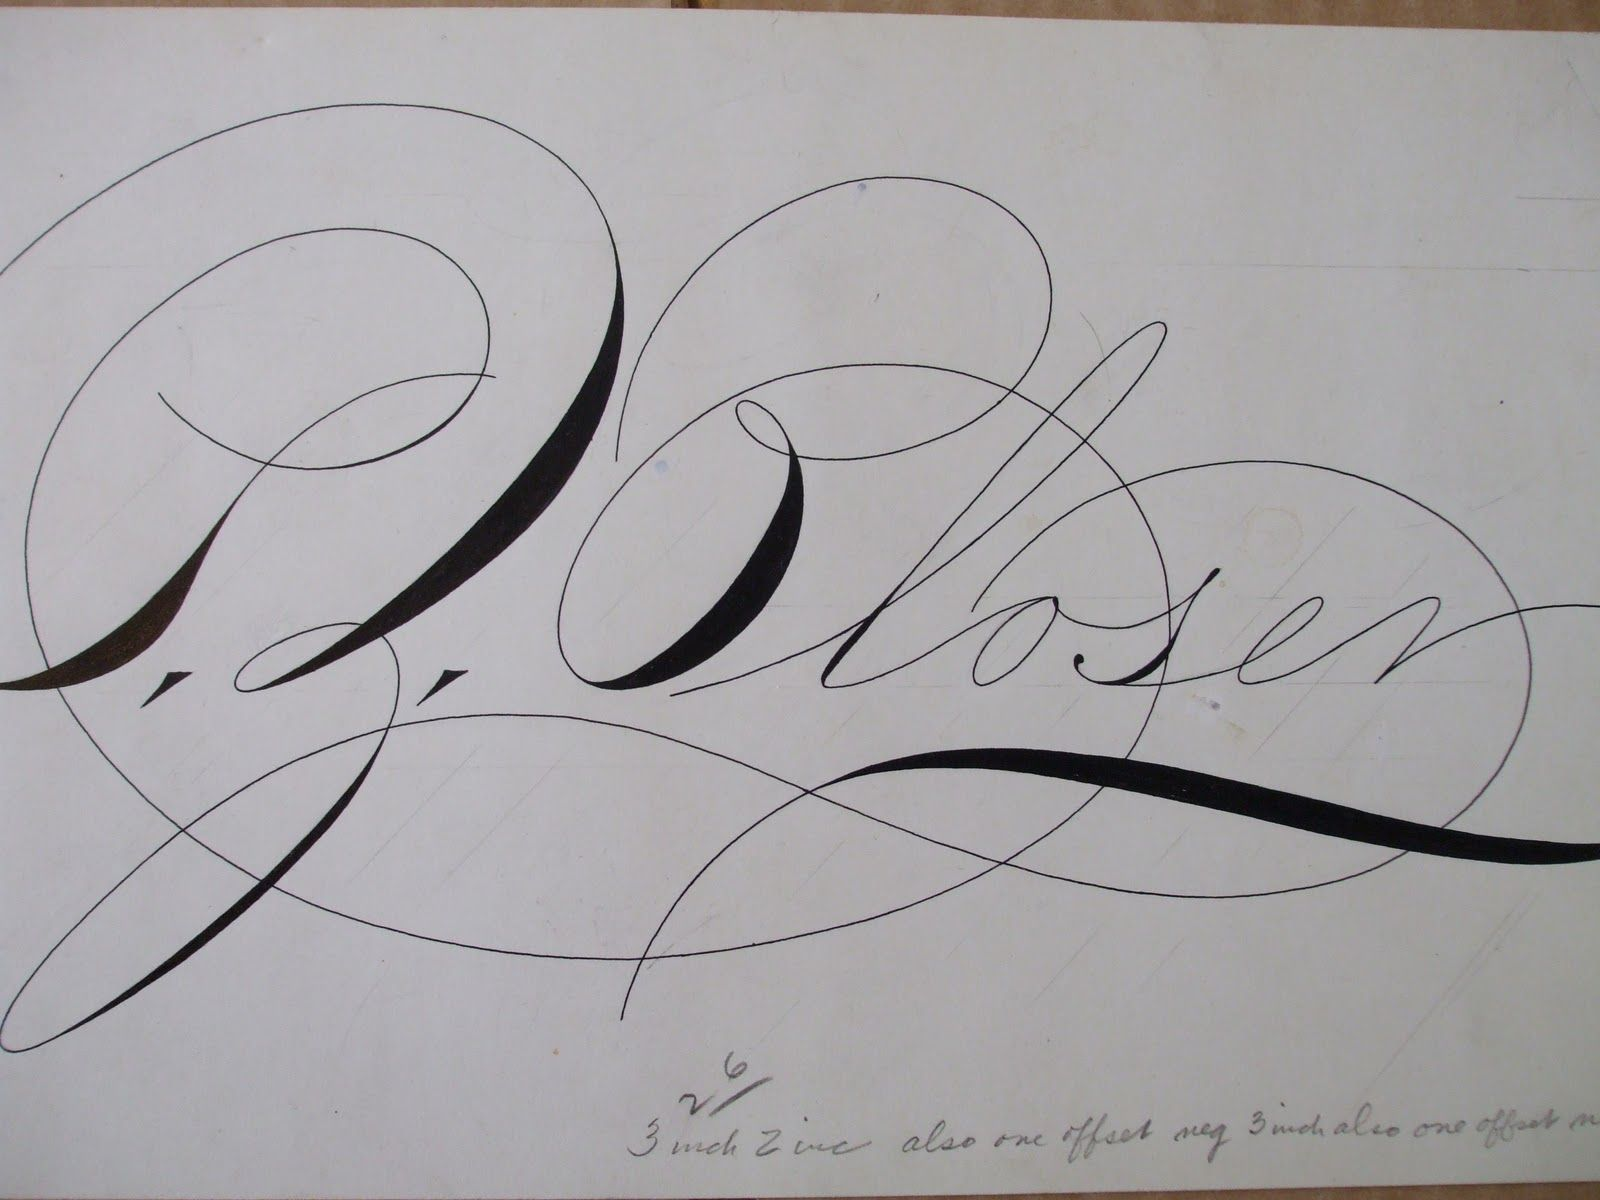 Spencerian Script By Michael Sull